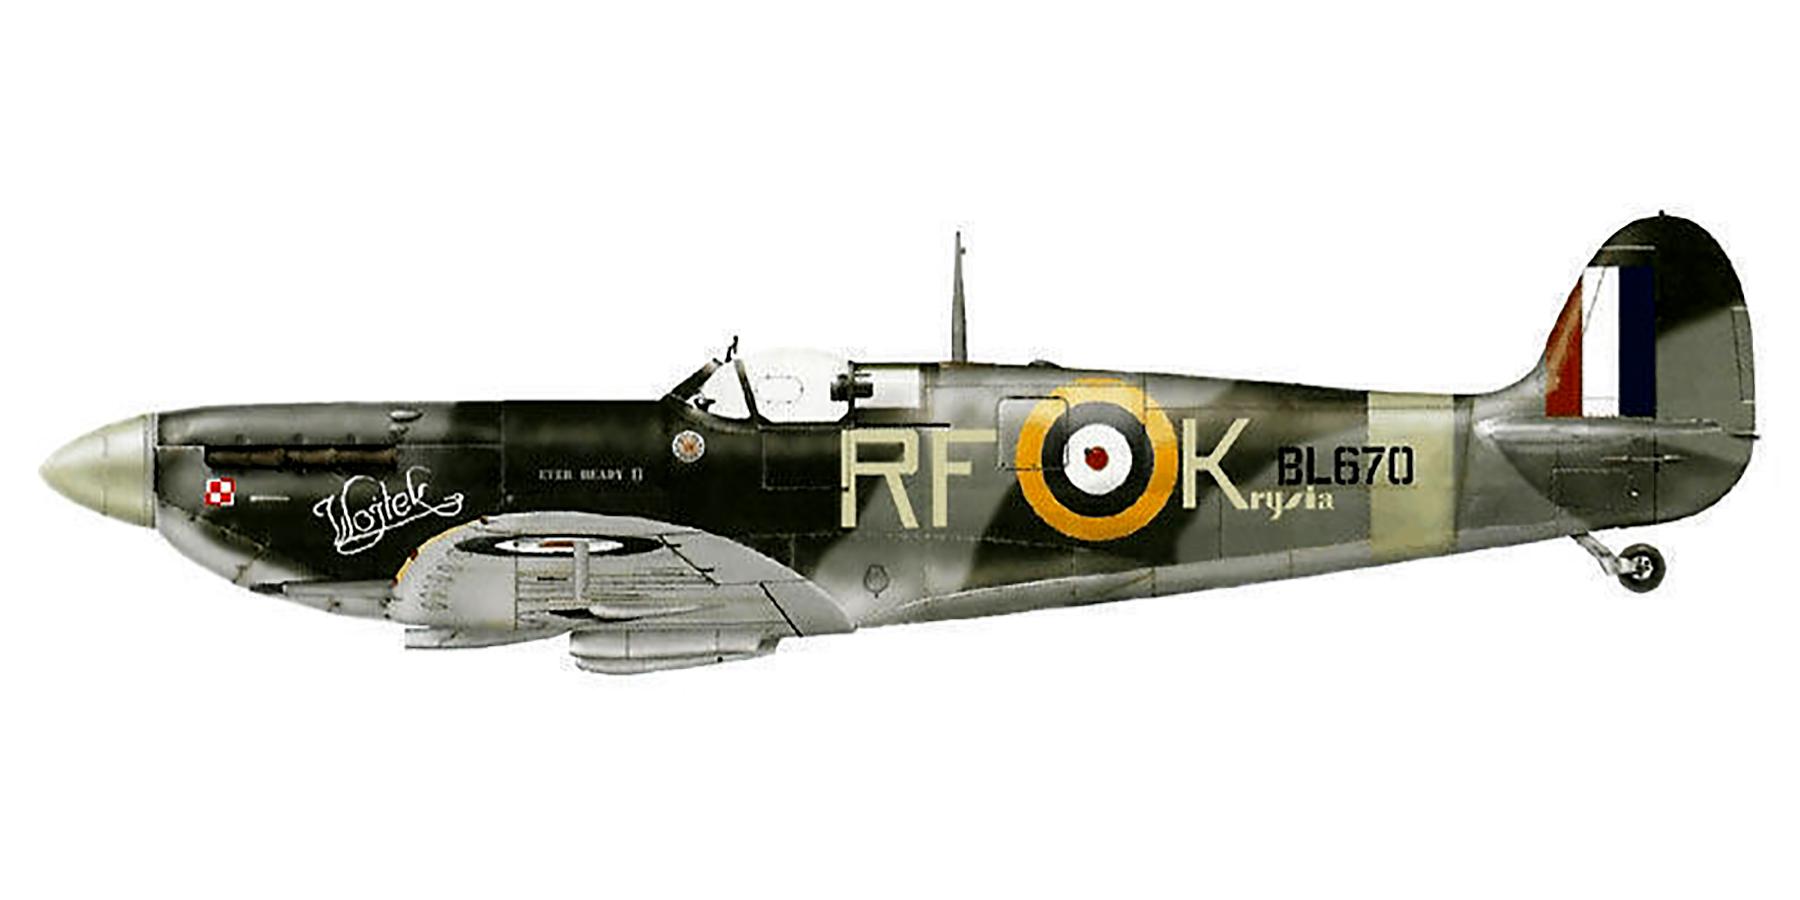 Spitfire MkVb RAF 303 Polish RFK Kolacskowski BL670 Northolt 1942 0A